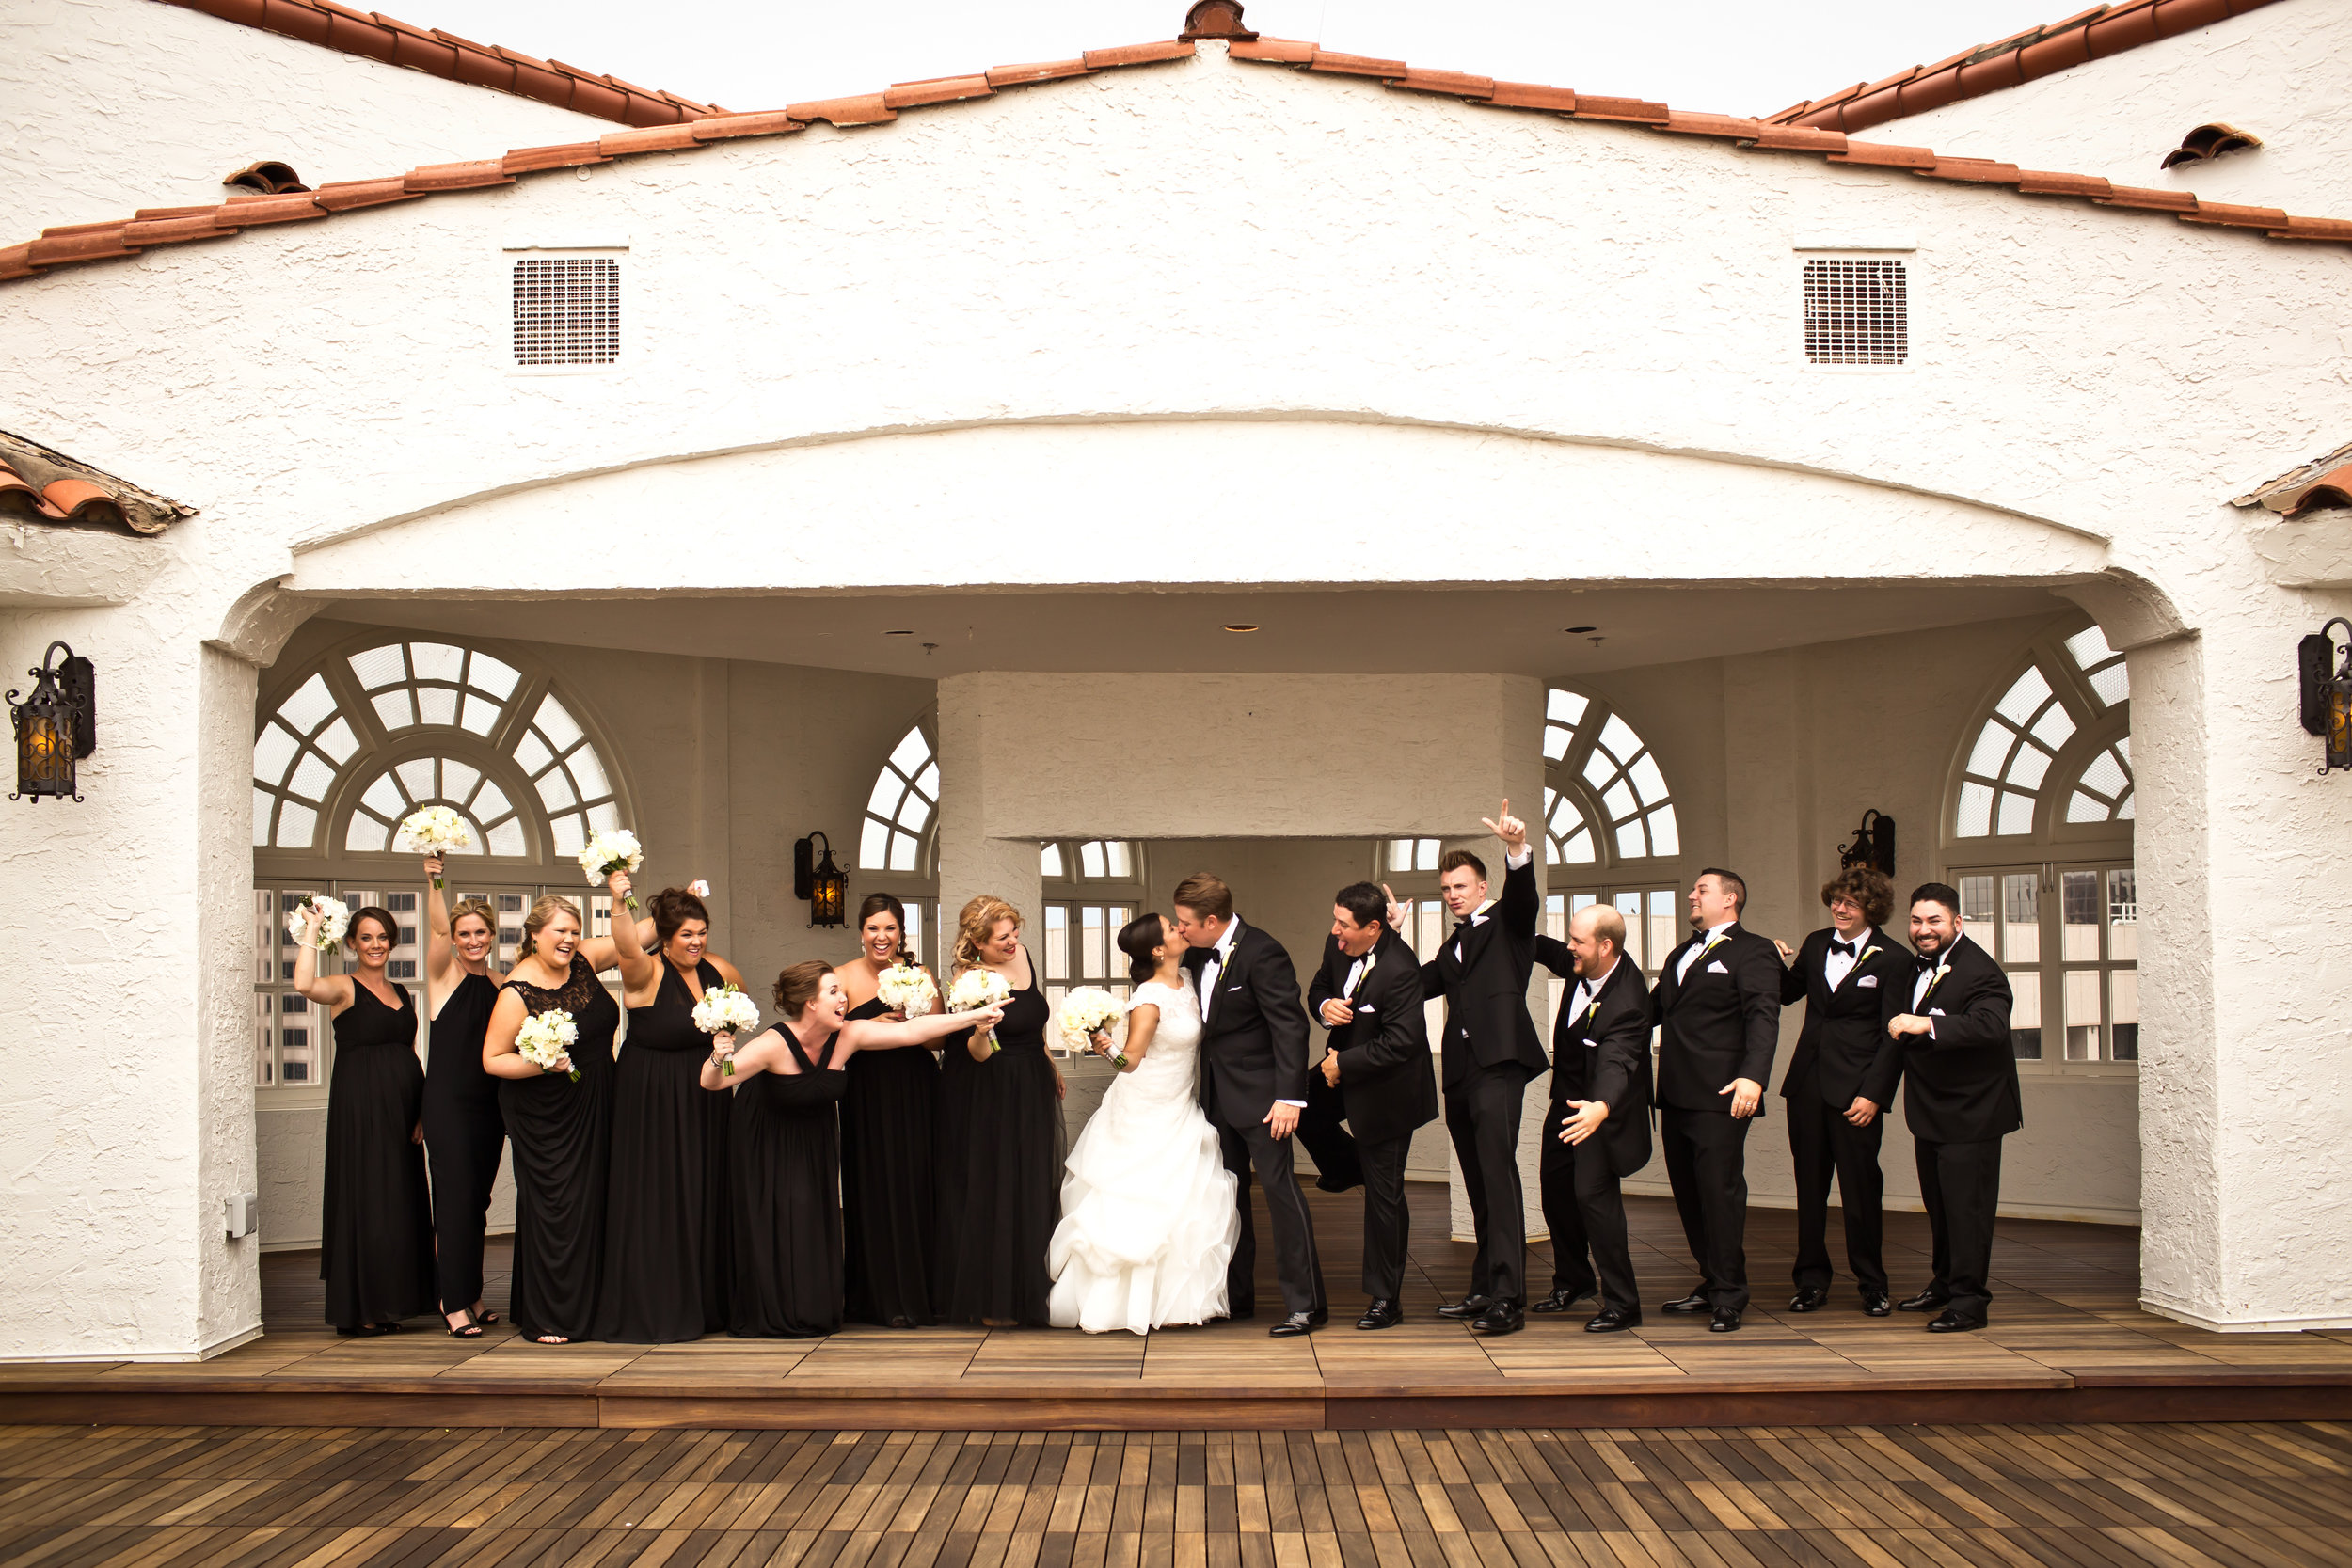 Marble_Falls_Horseshoe_Bay_Photographer_Torres_Wedding_27.jpg